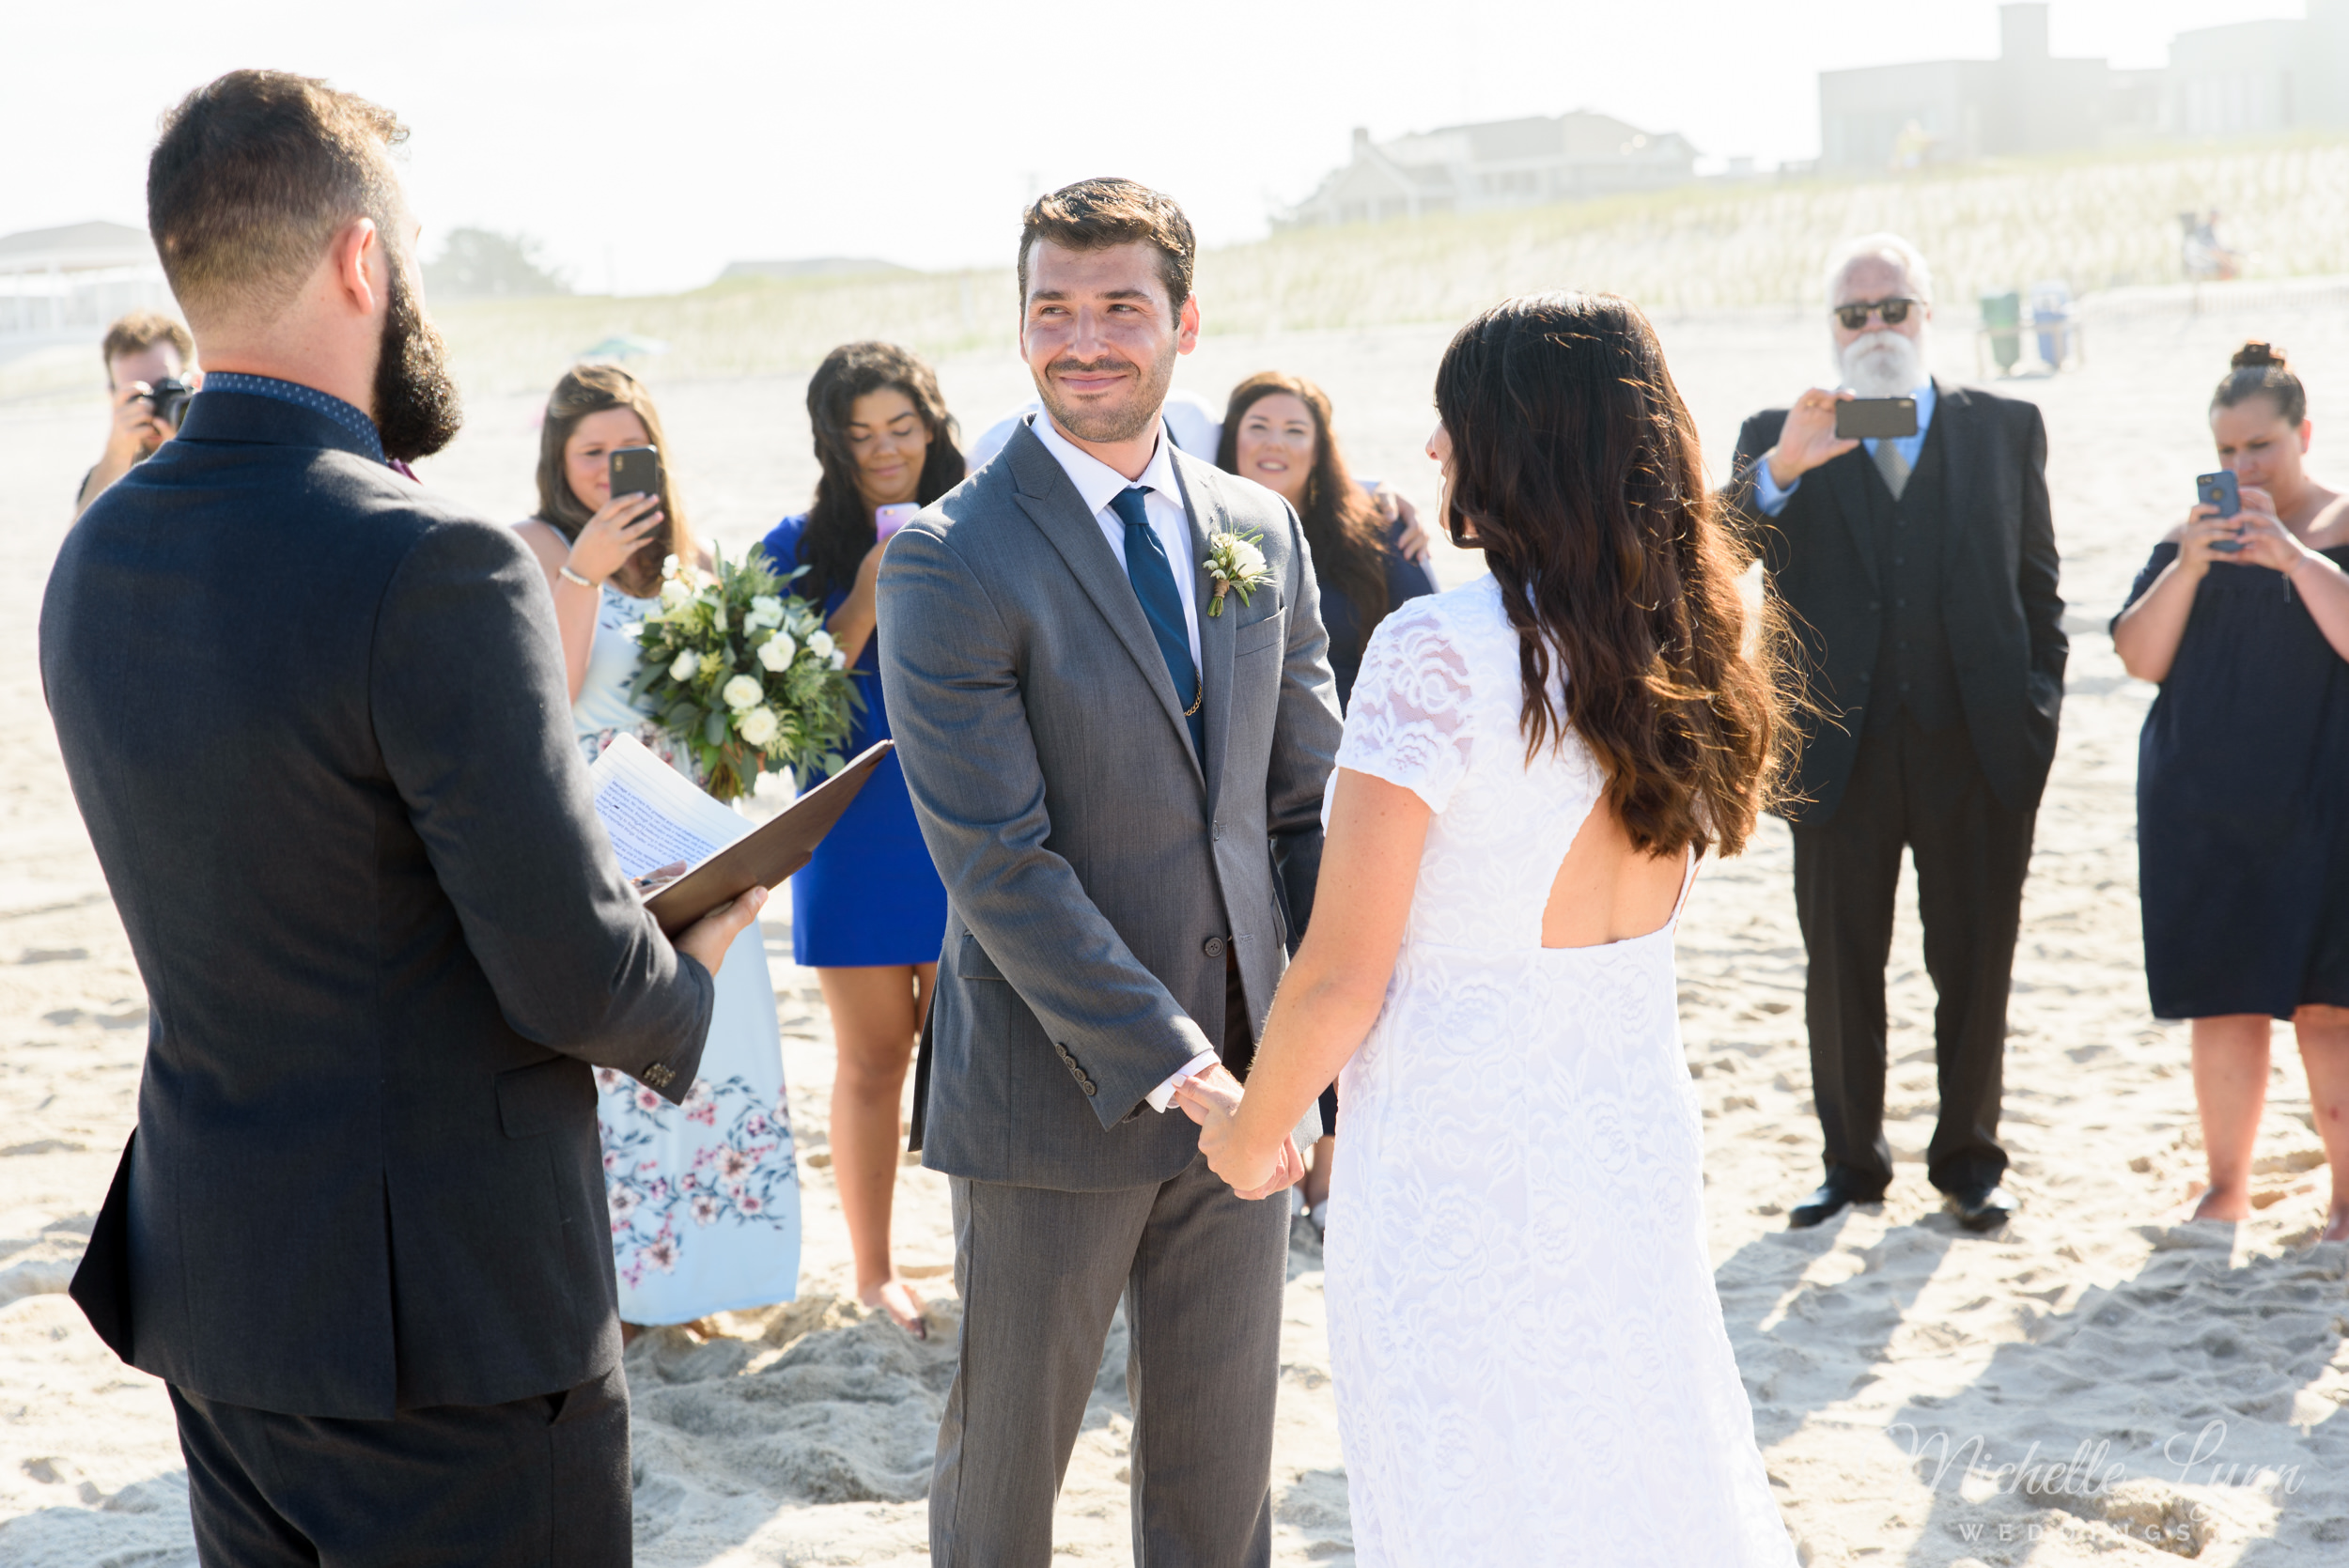 mlw-brant-beach-lbi-wedding-photography-28.jpg